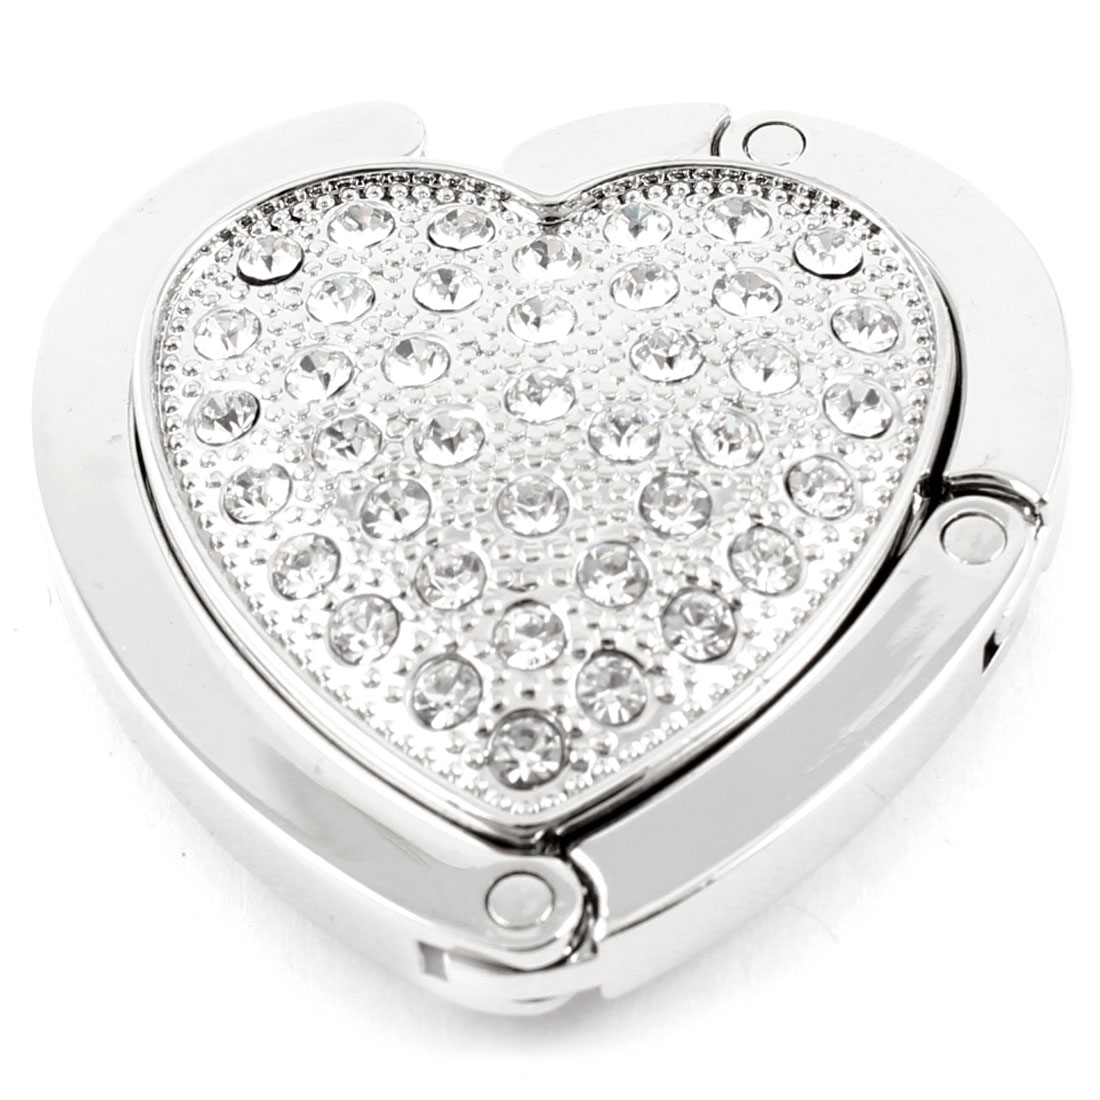 White Silver Tone Rhinestone Detail Heart Design Foldable Handbag Hook